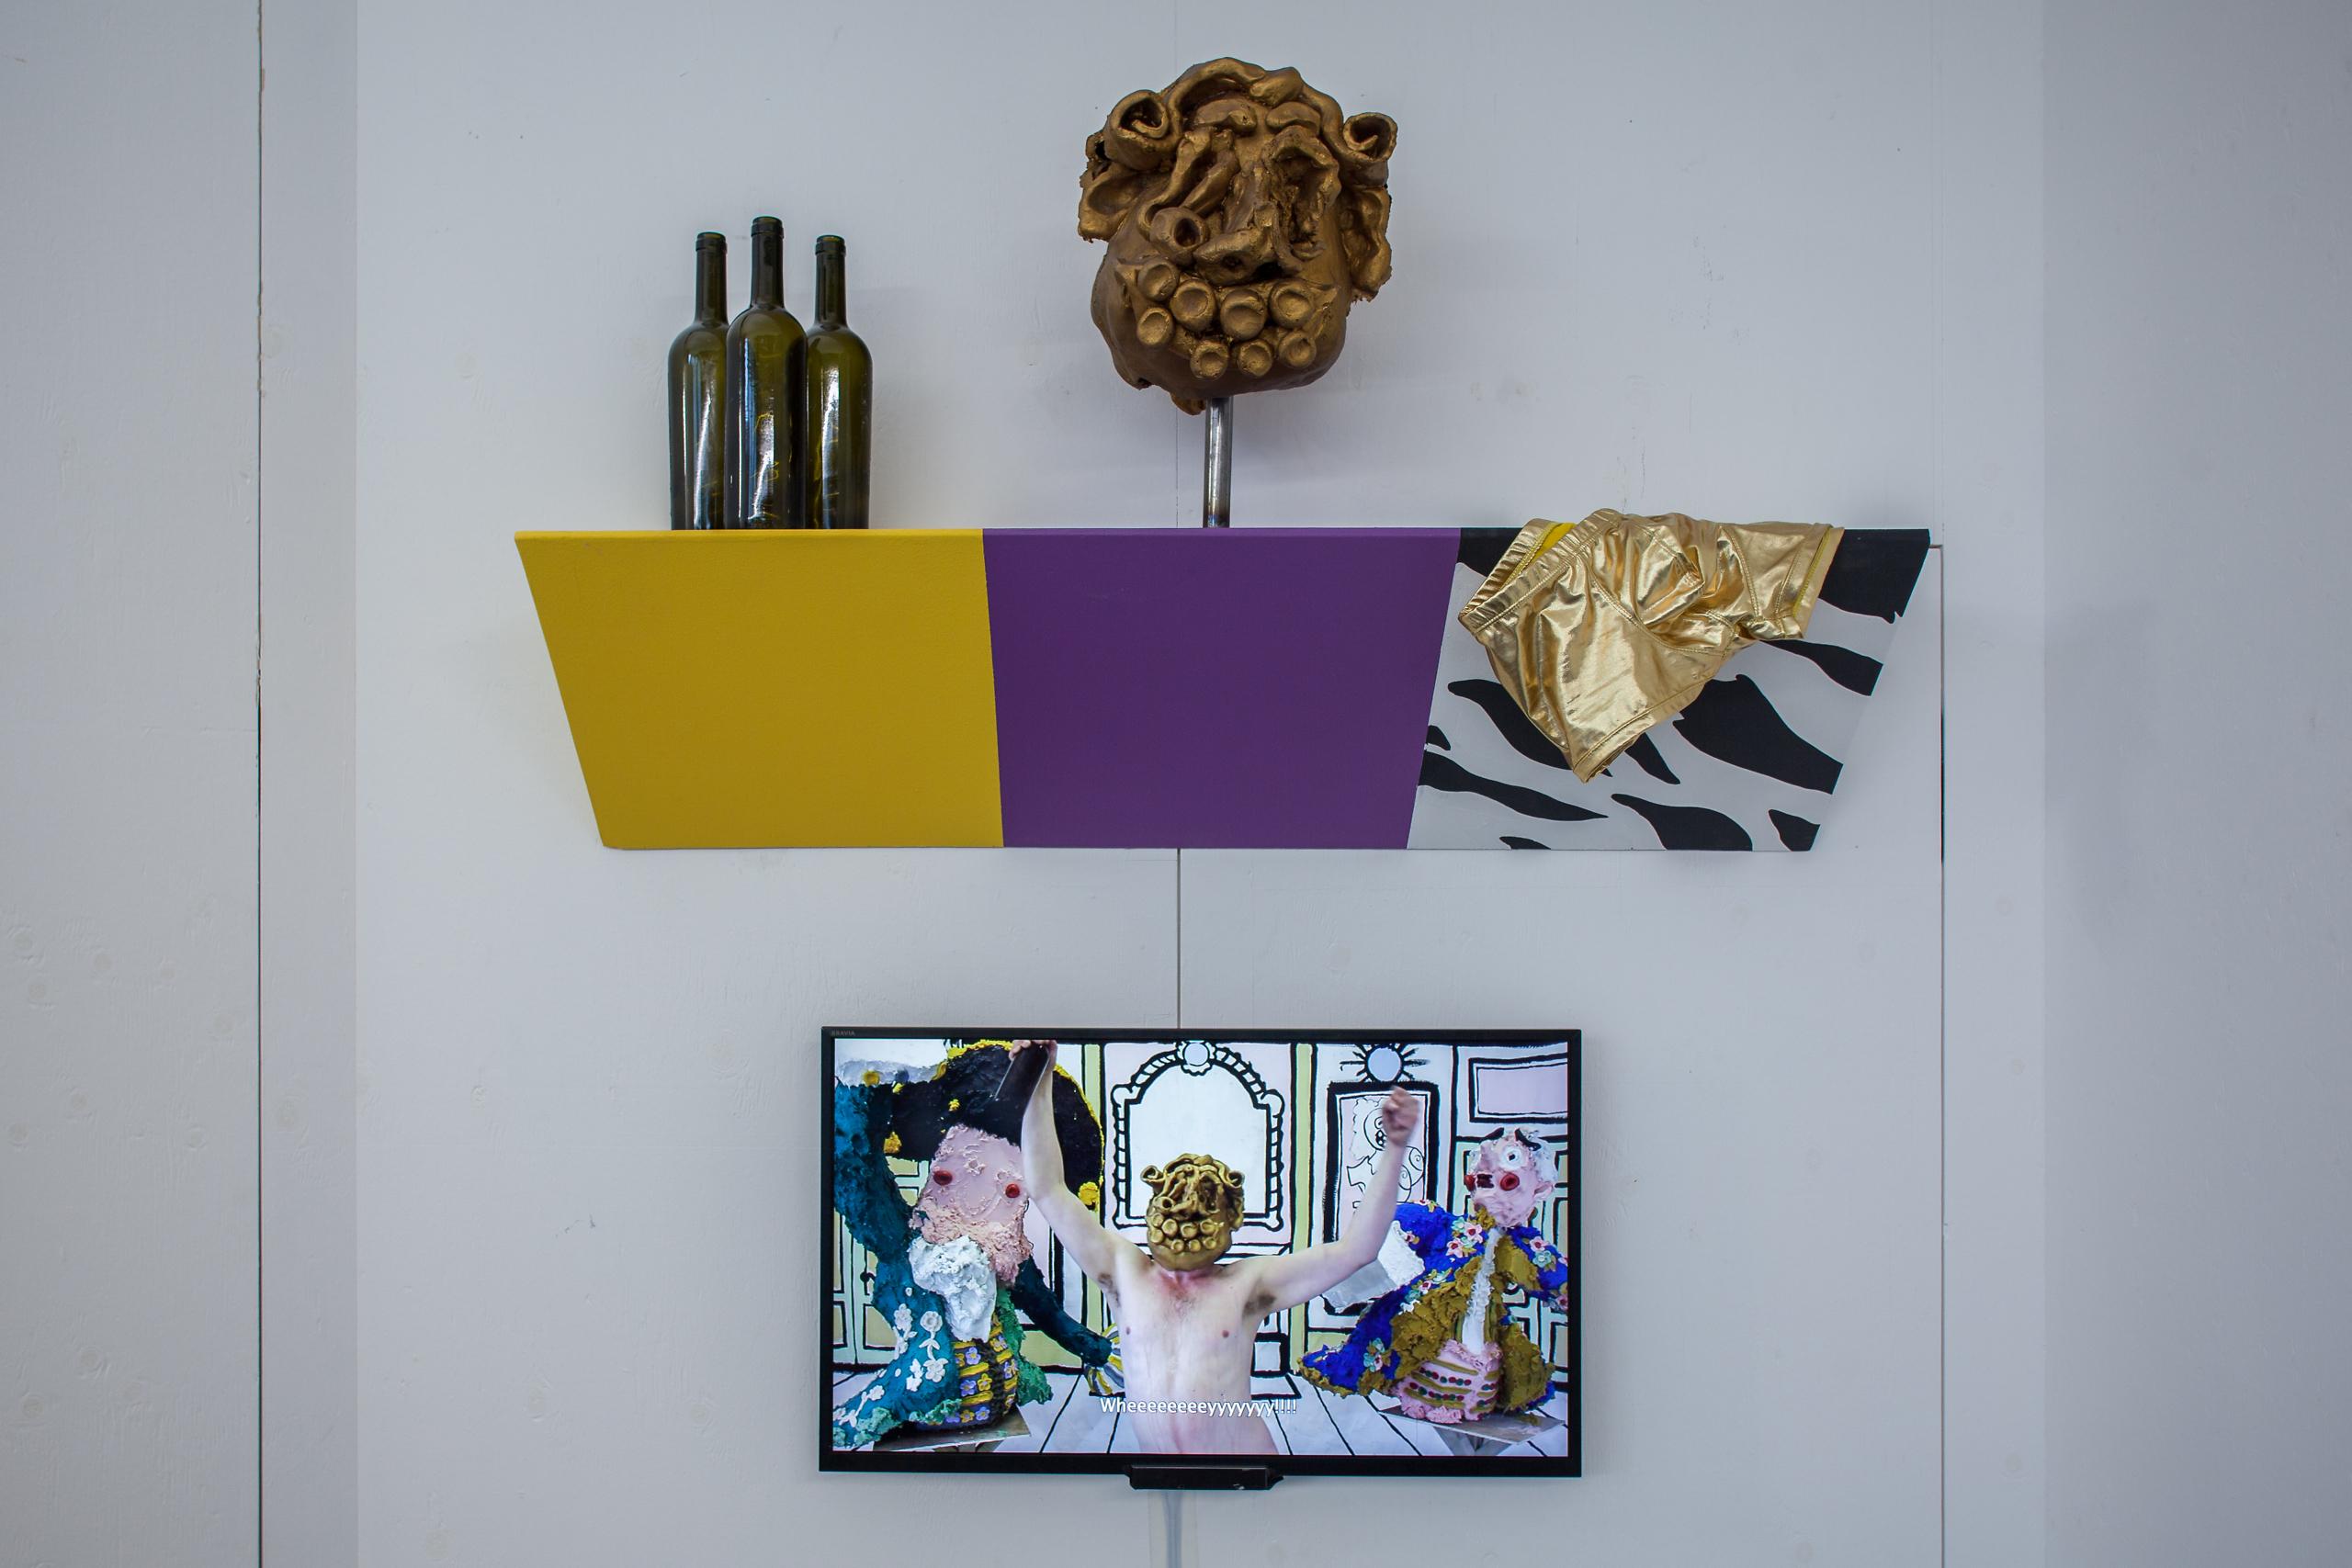 Jamie Fitzpatrick, SMUT, 2018. Installation view. VITRINE, Basel, CH. Photographer: Nicolas Gysin.